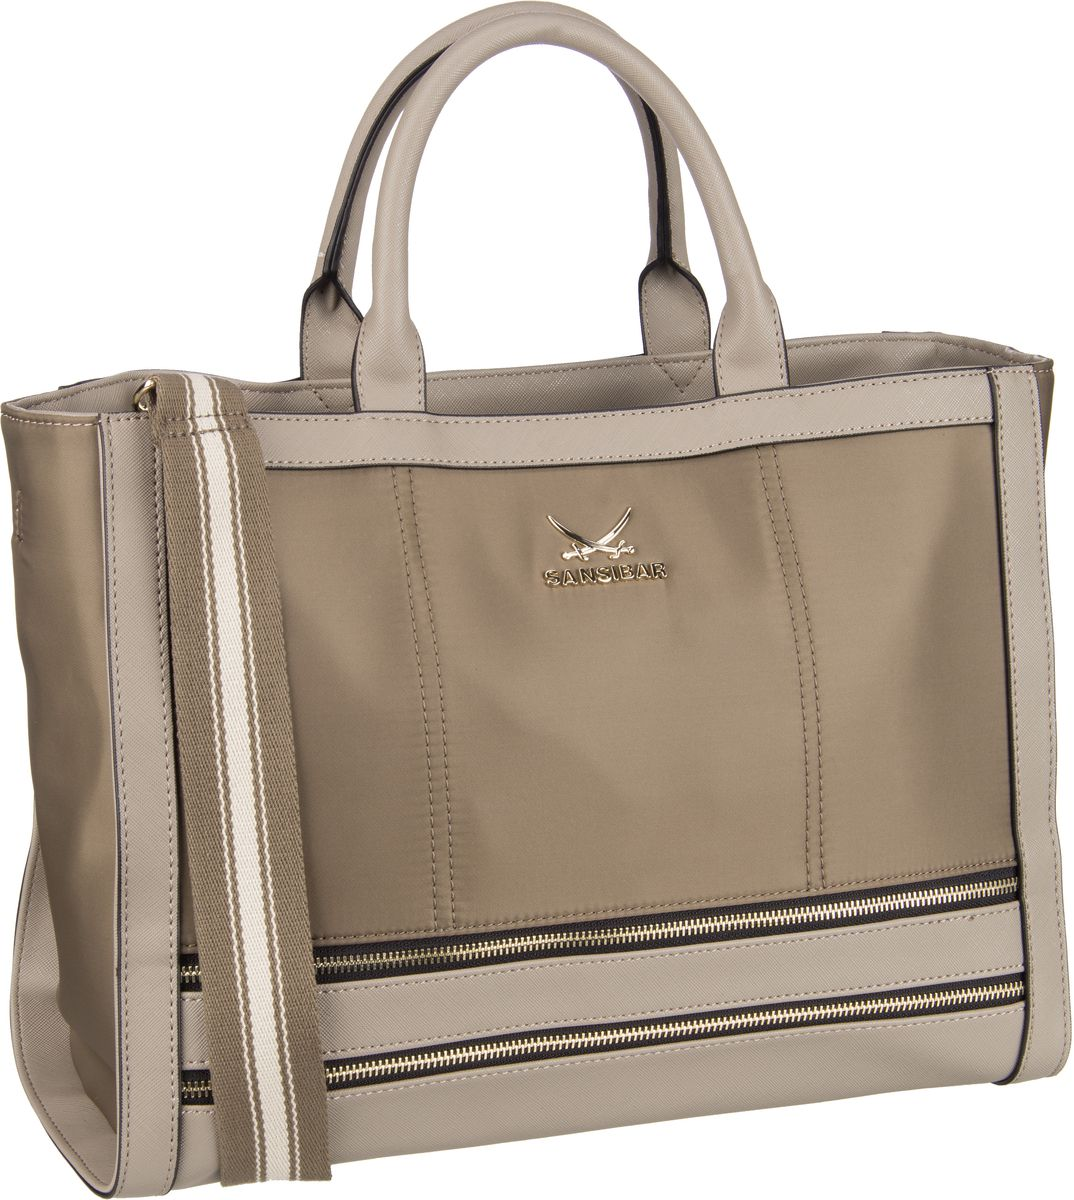 Handtasche Shopper Bag 1279 Taupe